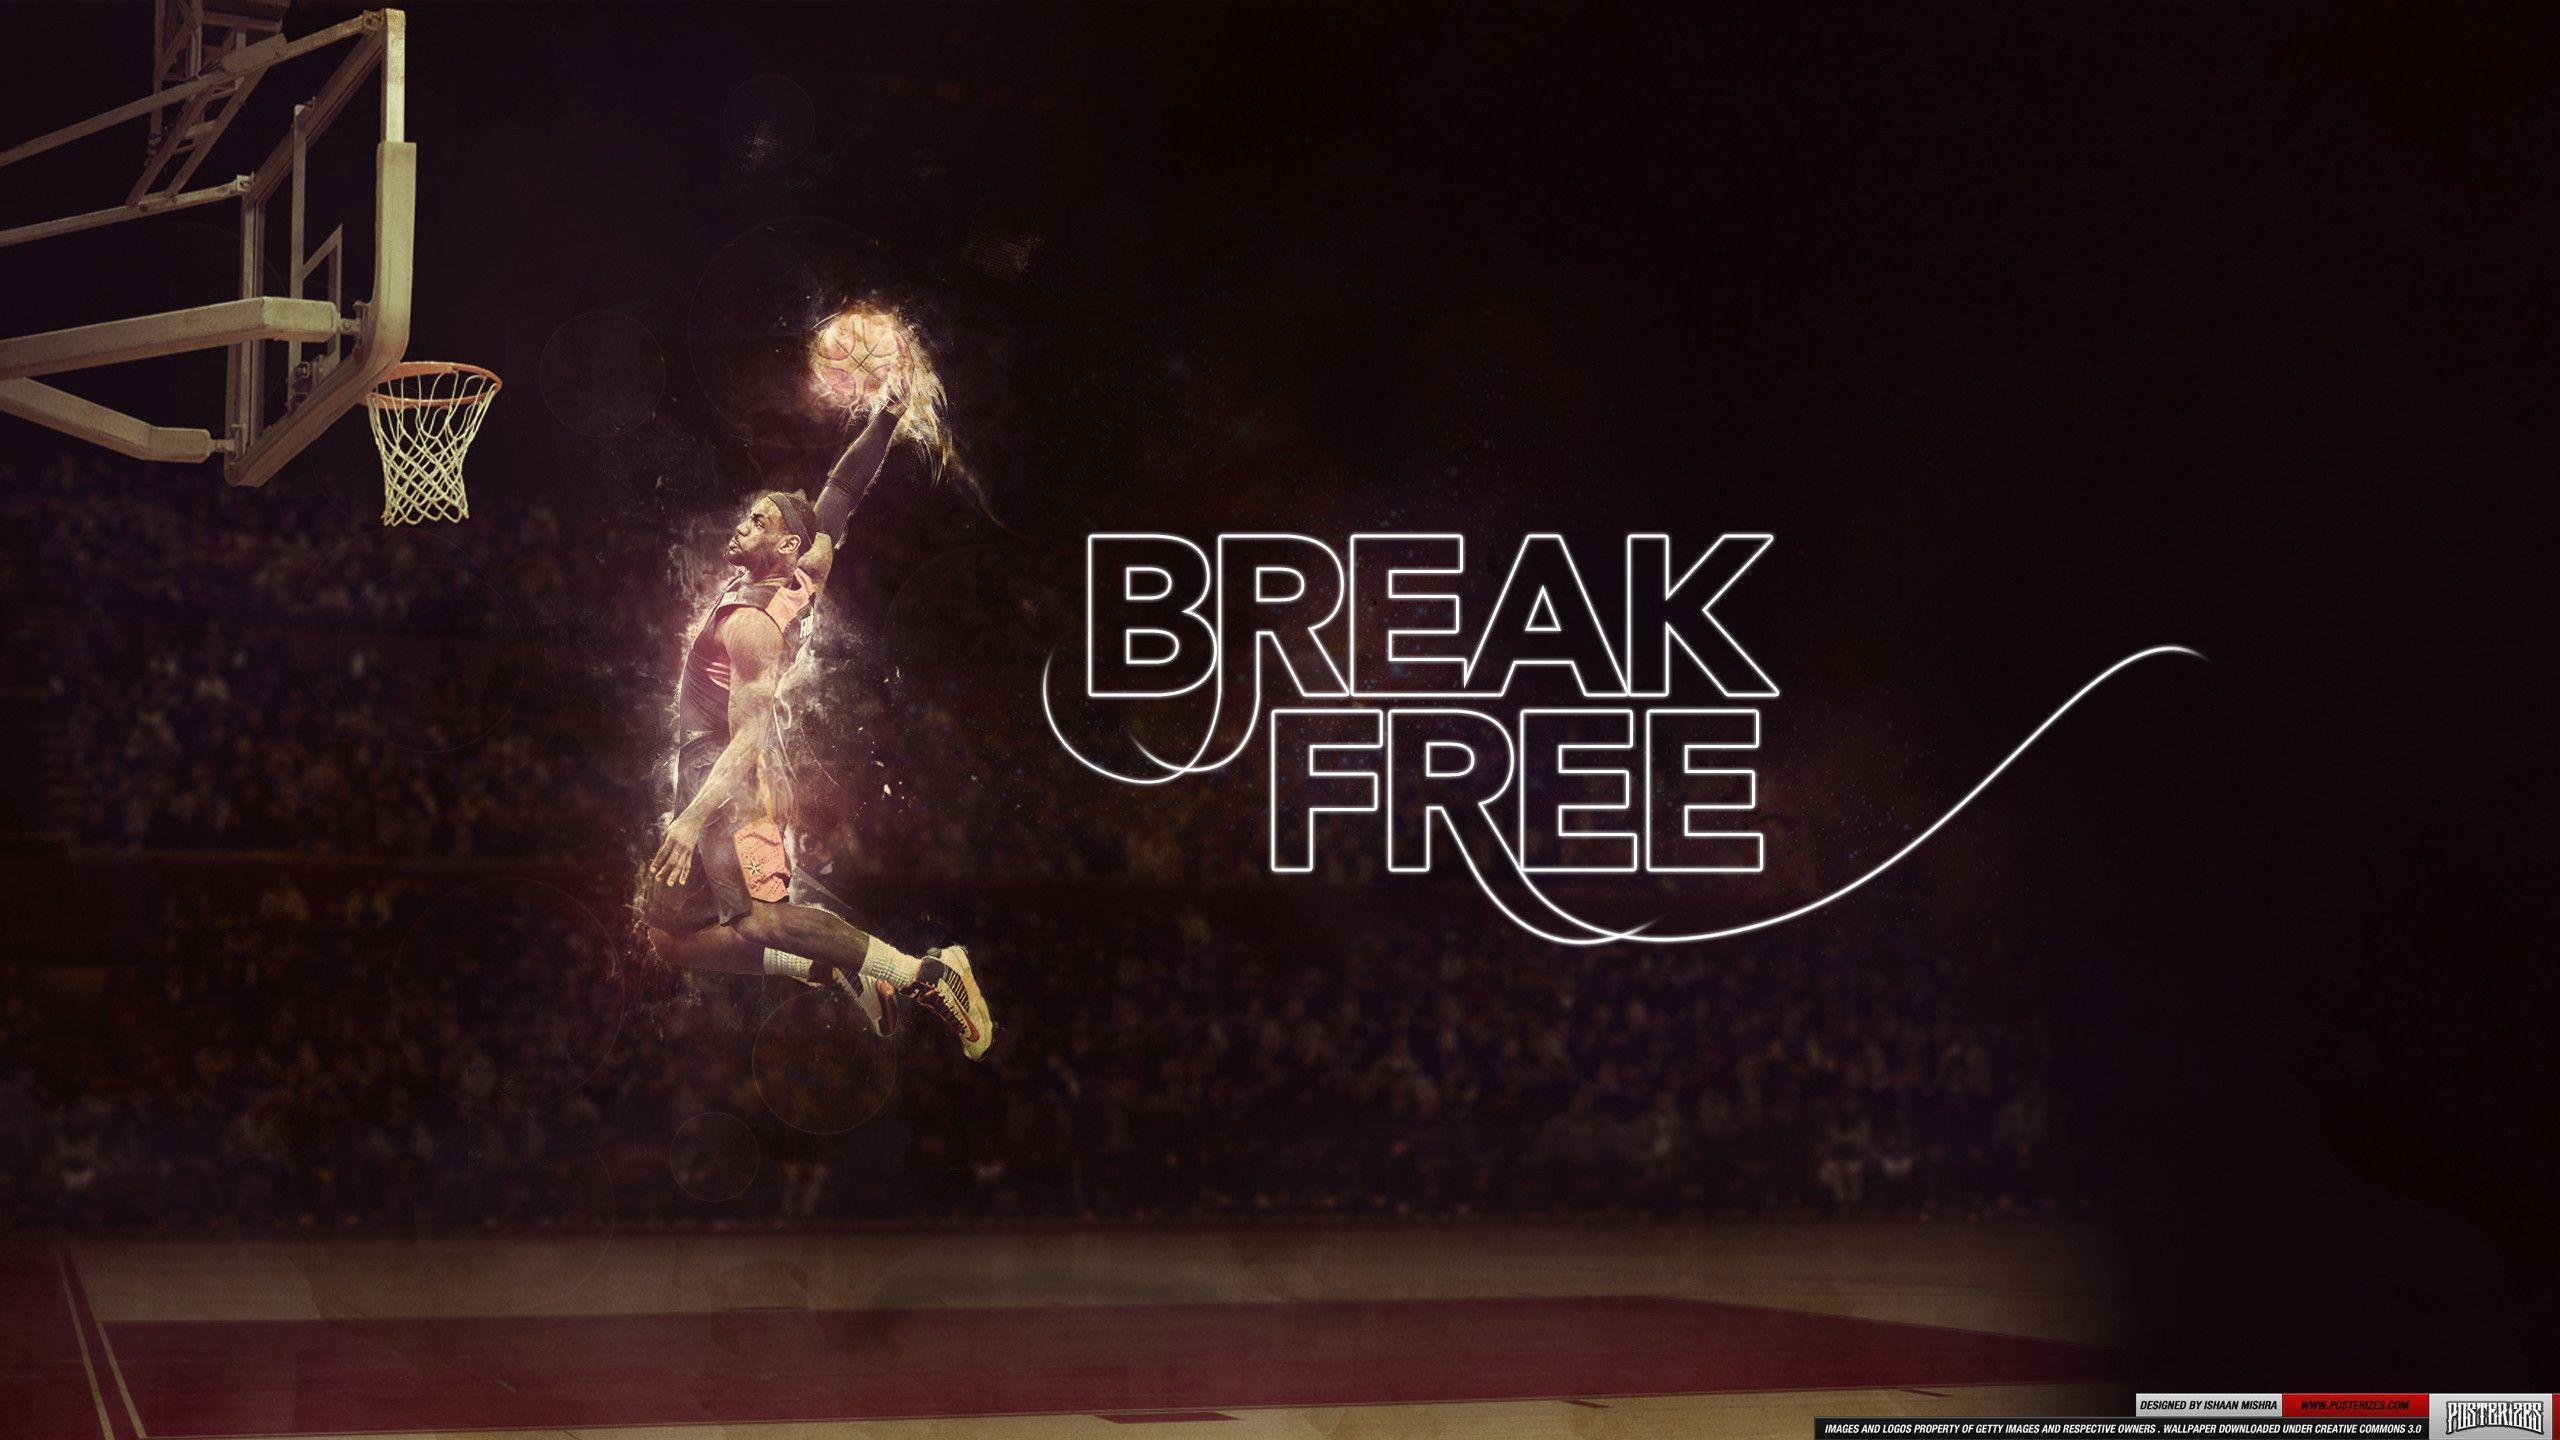 NBA Wallpapers Lebron James 2015 - Wallpaper Cave